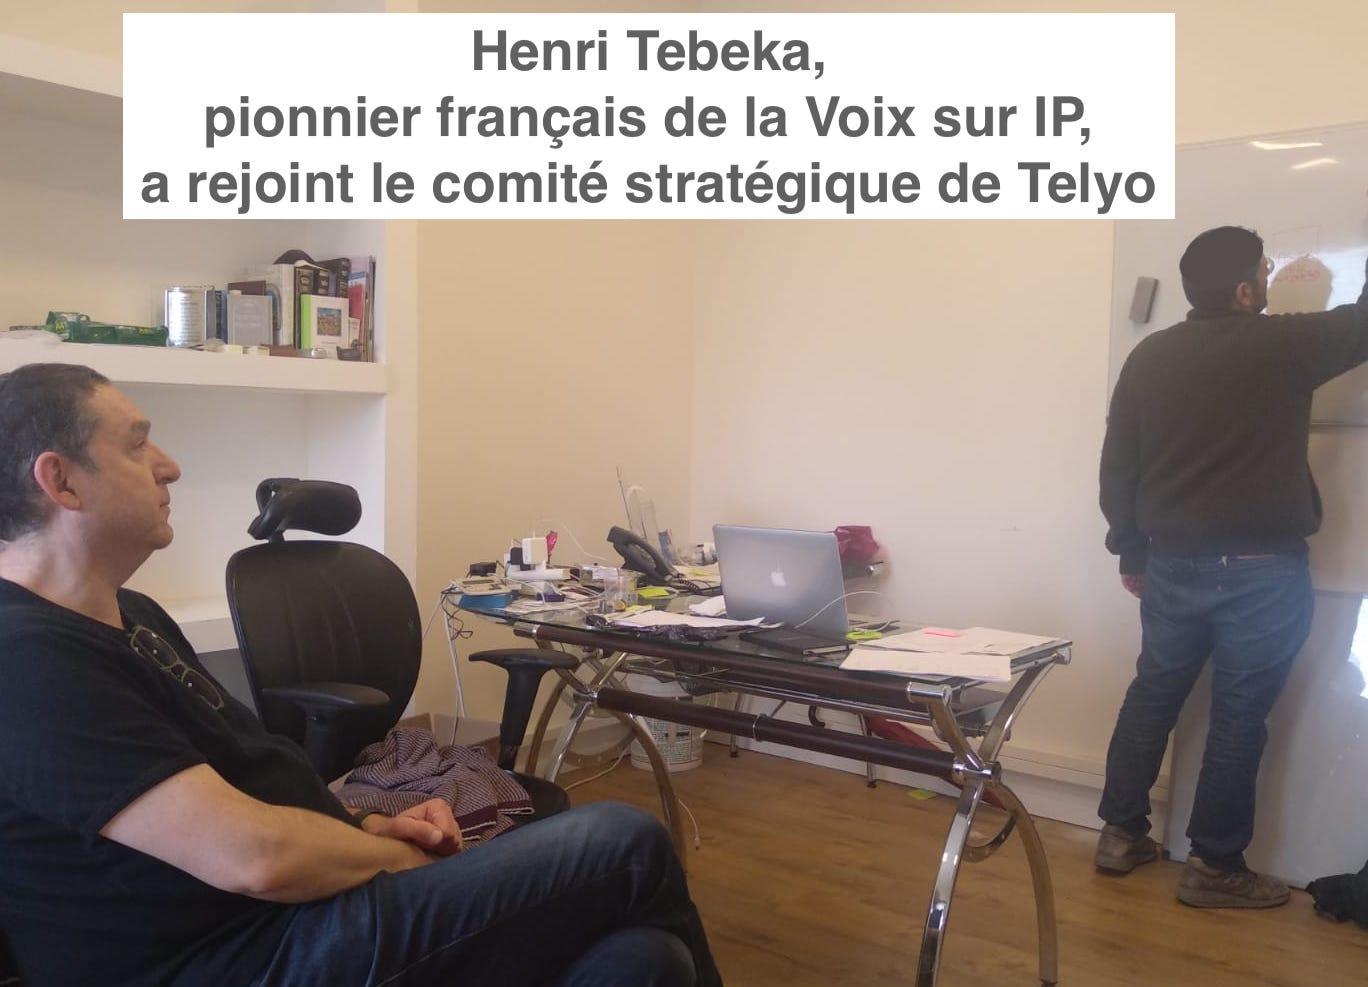 Henri Tebeka chez Telyo